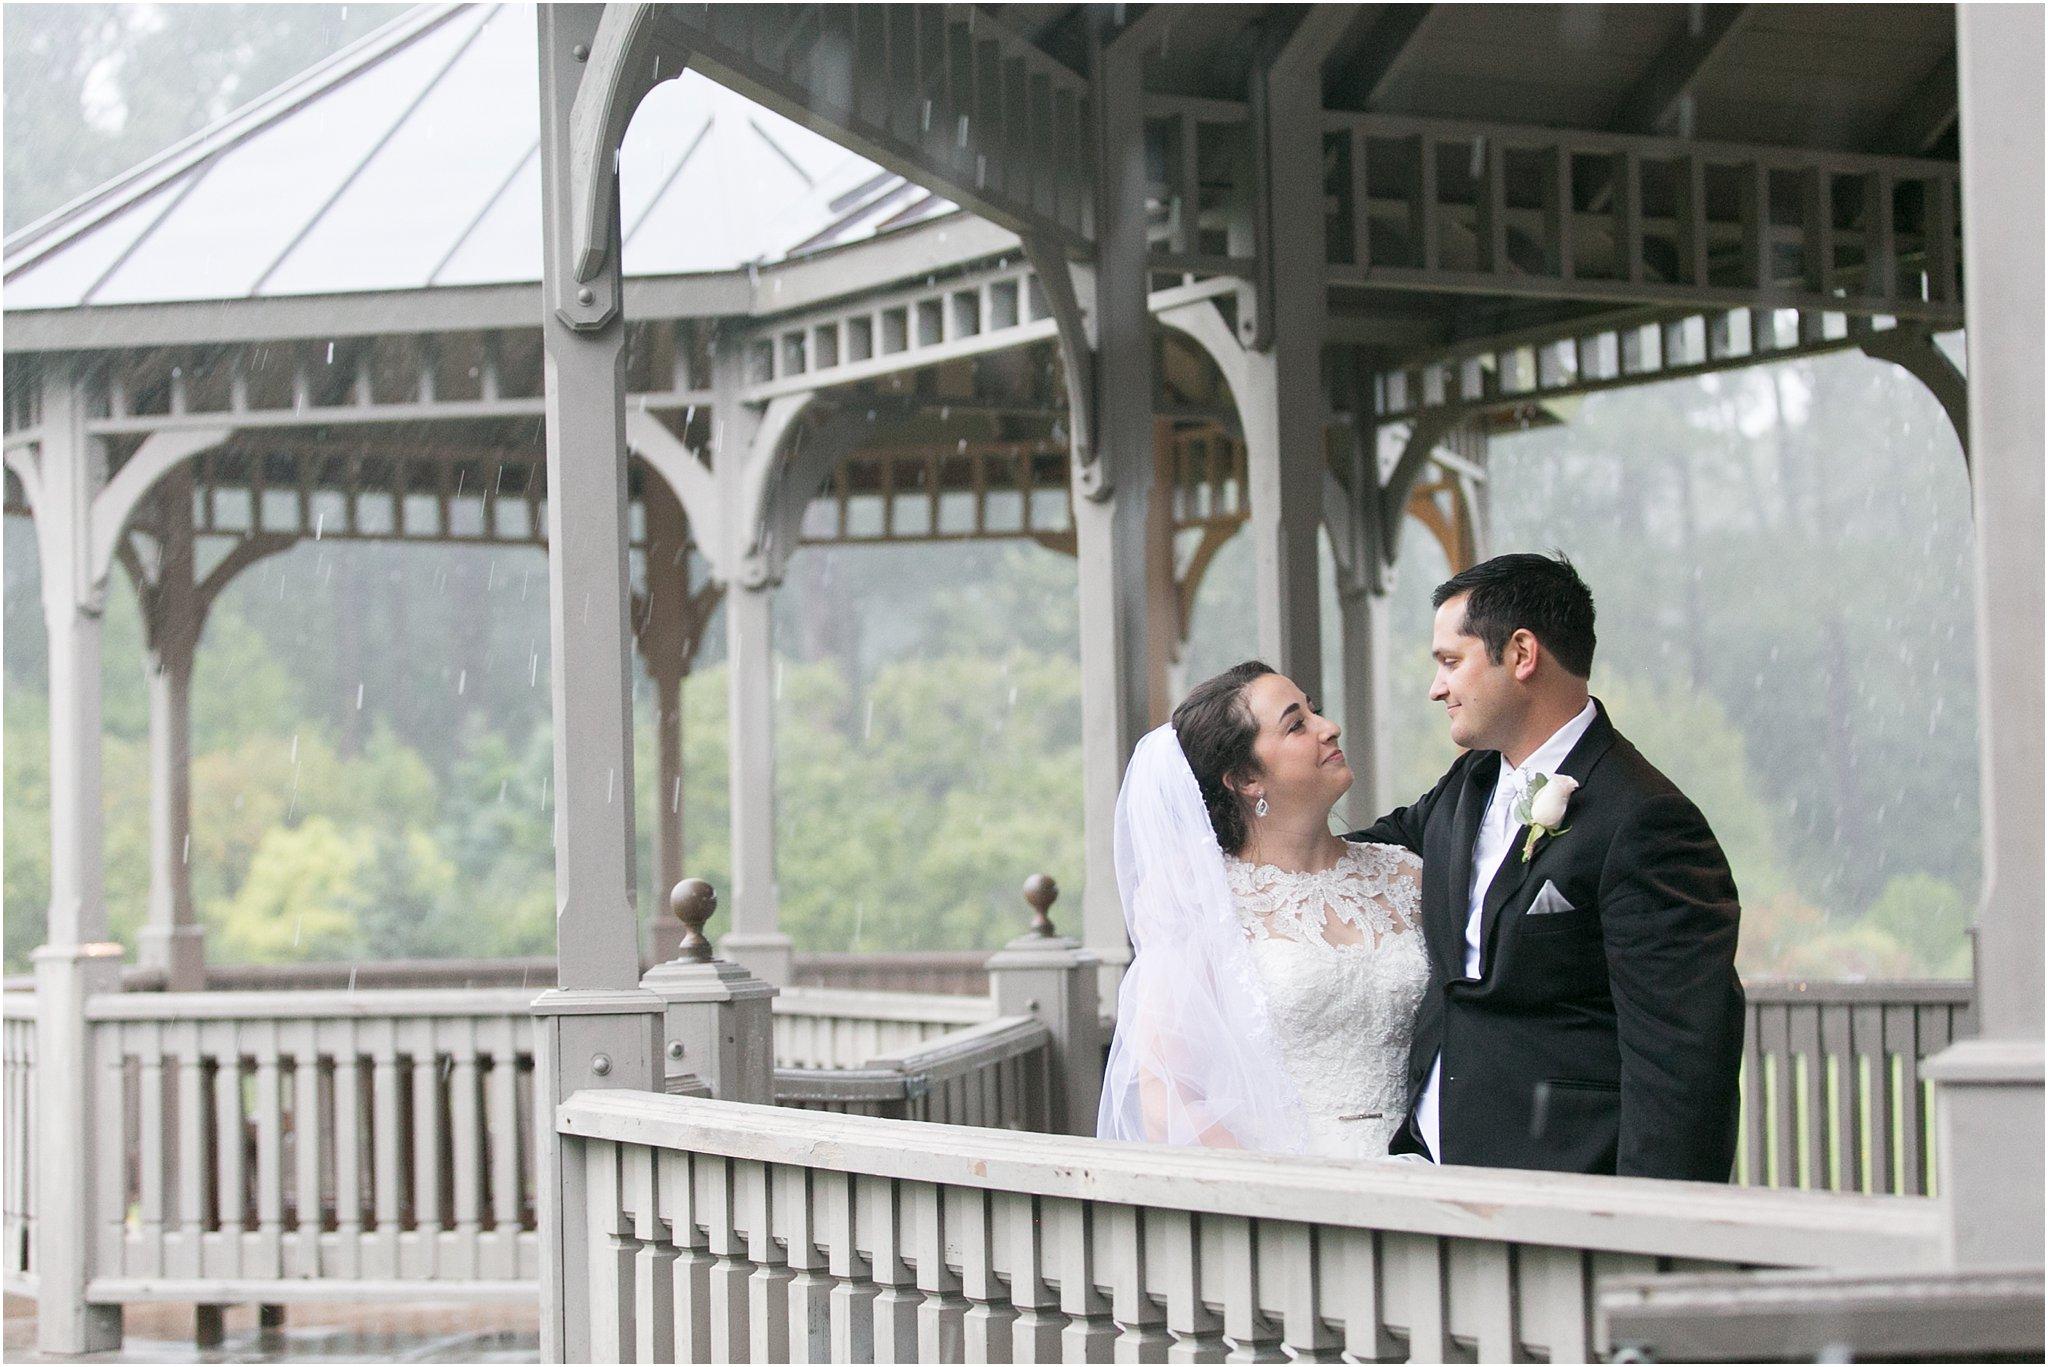 jessica_ryan_photography_virginia_wedding_photographer_wedding_hurricane_norfolk_botanical_gardens_hurricane_matthew_wedding_3567